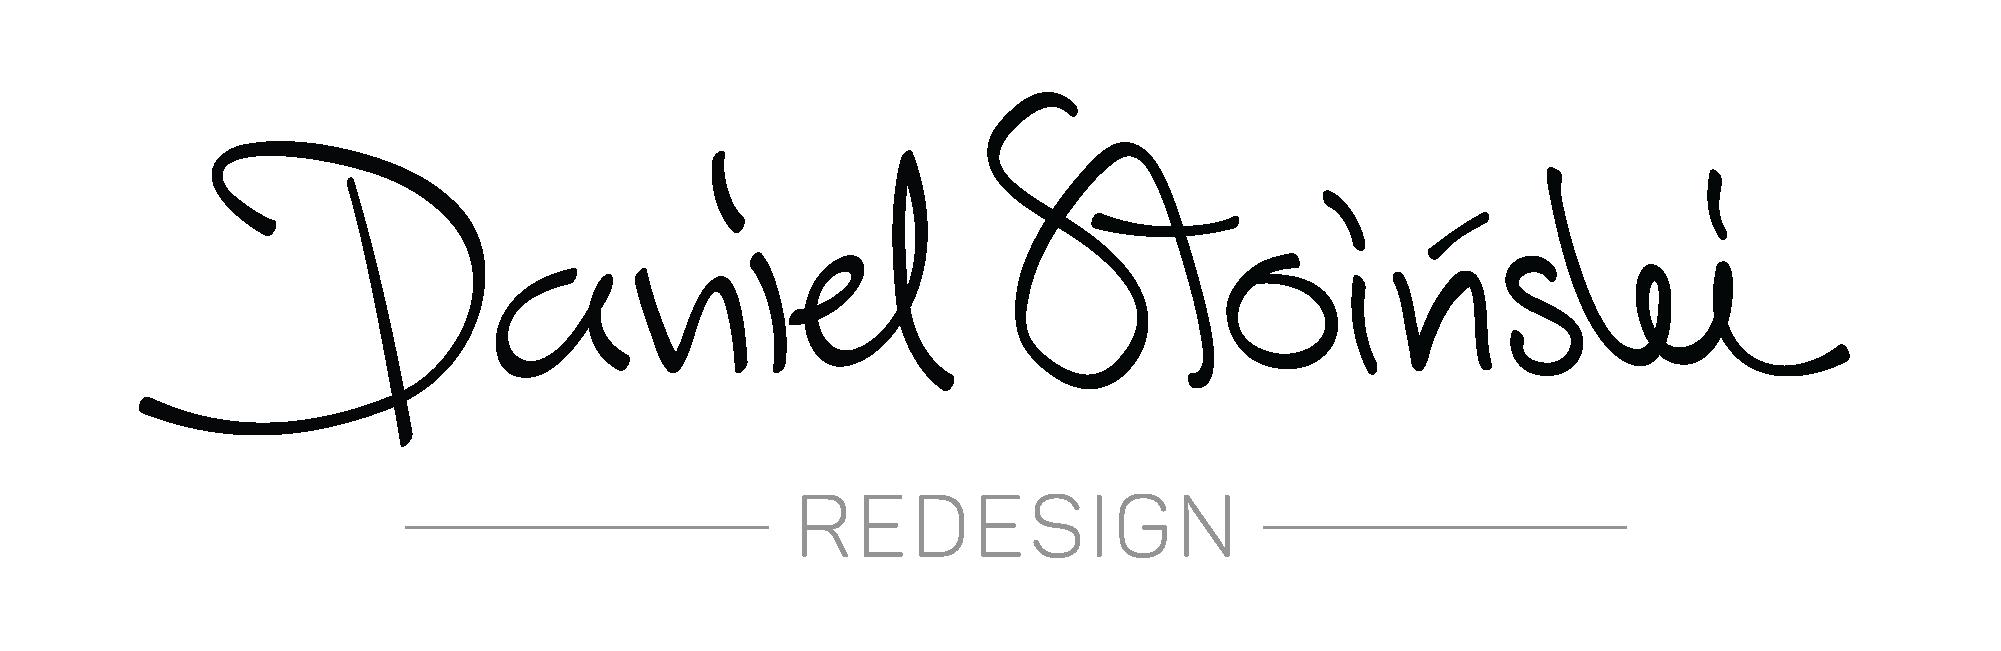 Daniel Stoiński Redesign